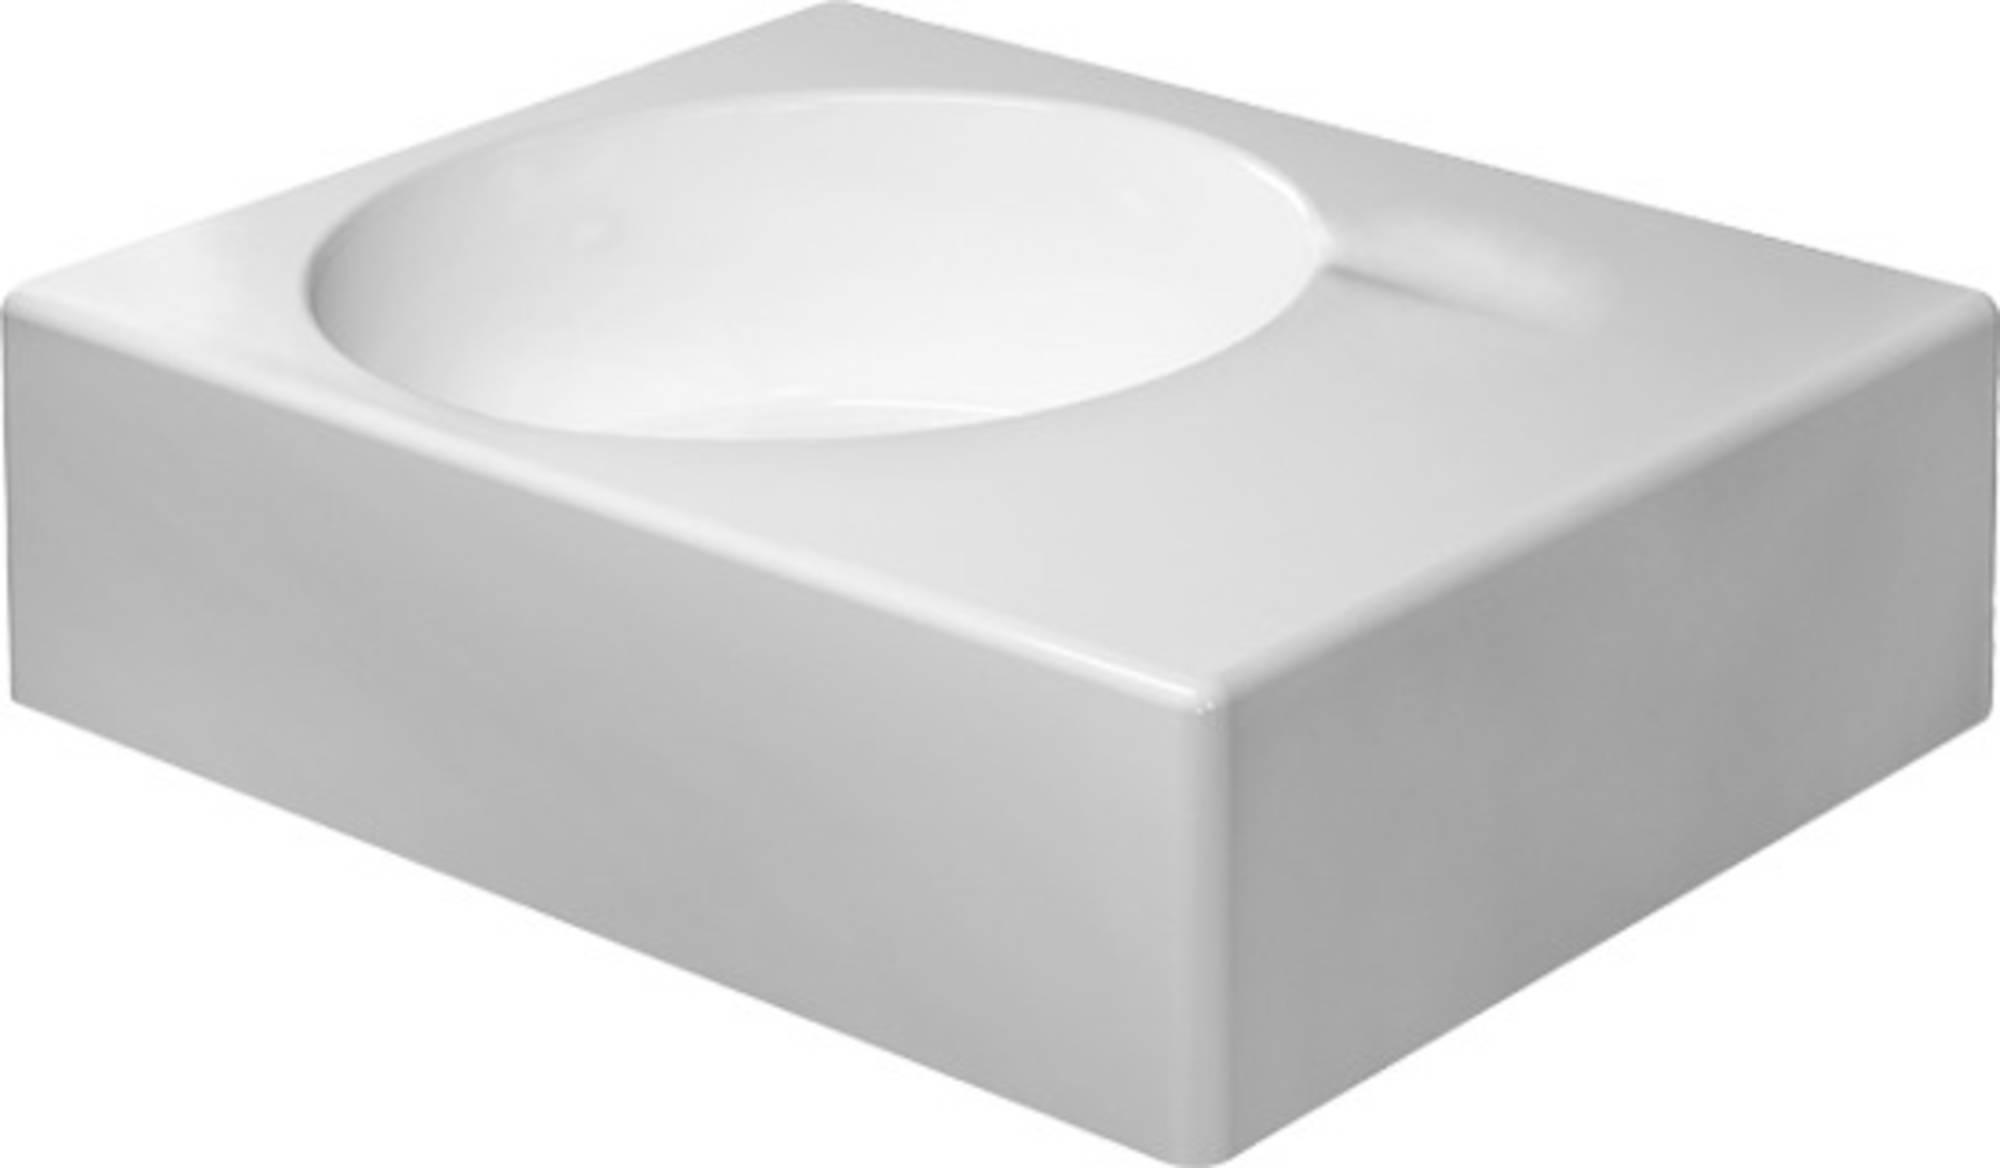 Duravit Scola wastafel 61,5x46 bak links zonder kraangat, wit